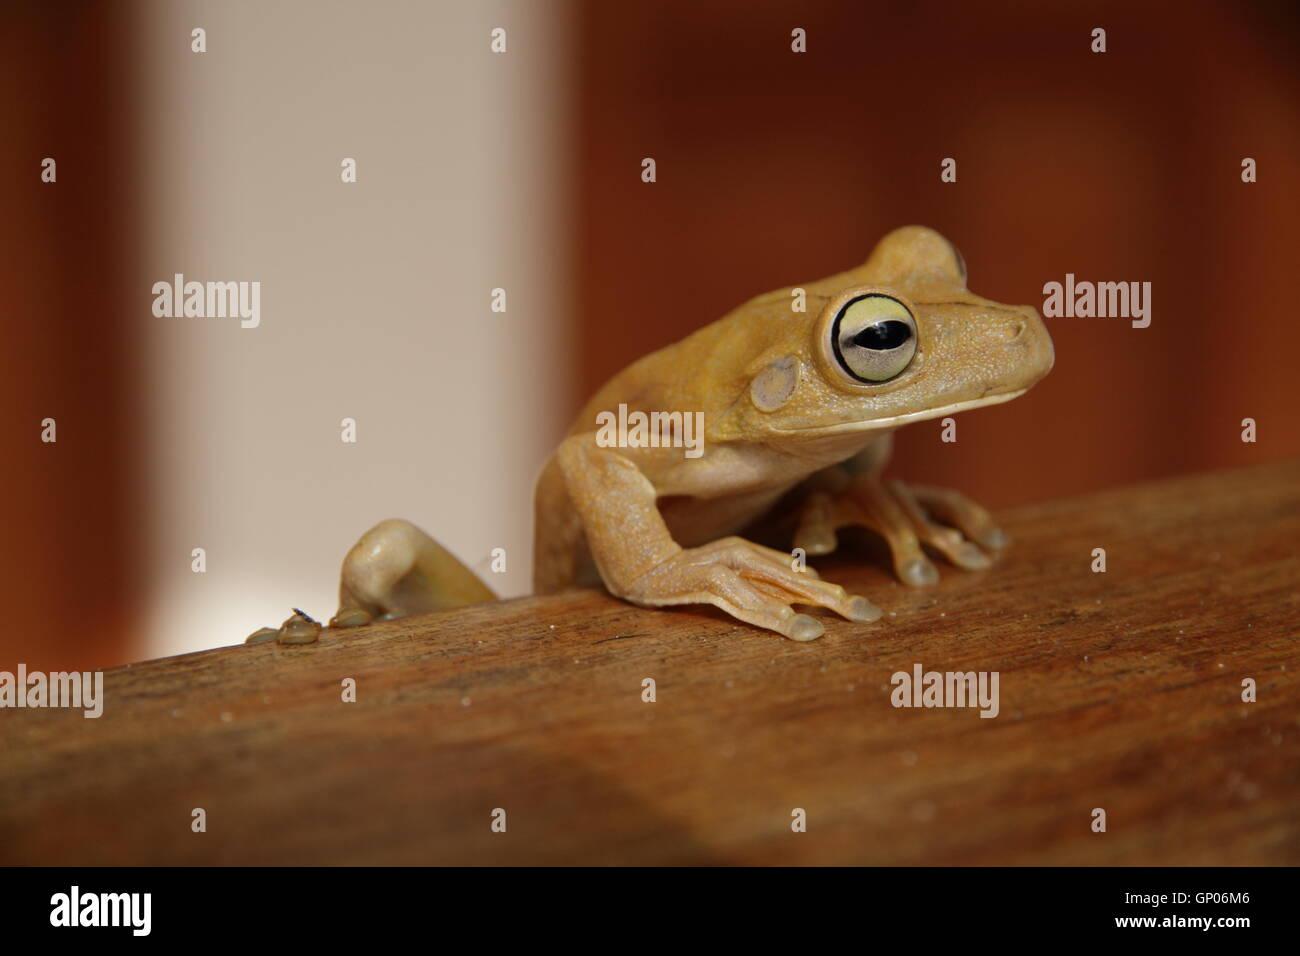 Close up shot of a Gladiator Tree Frog (Hypsiboas rosenbergi) in Manuel Antonio, Costa Rica. - Stock Image